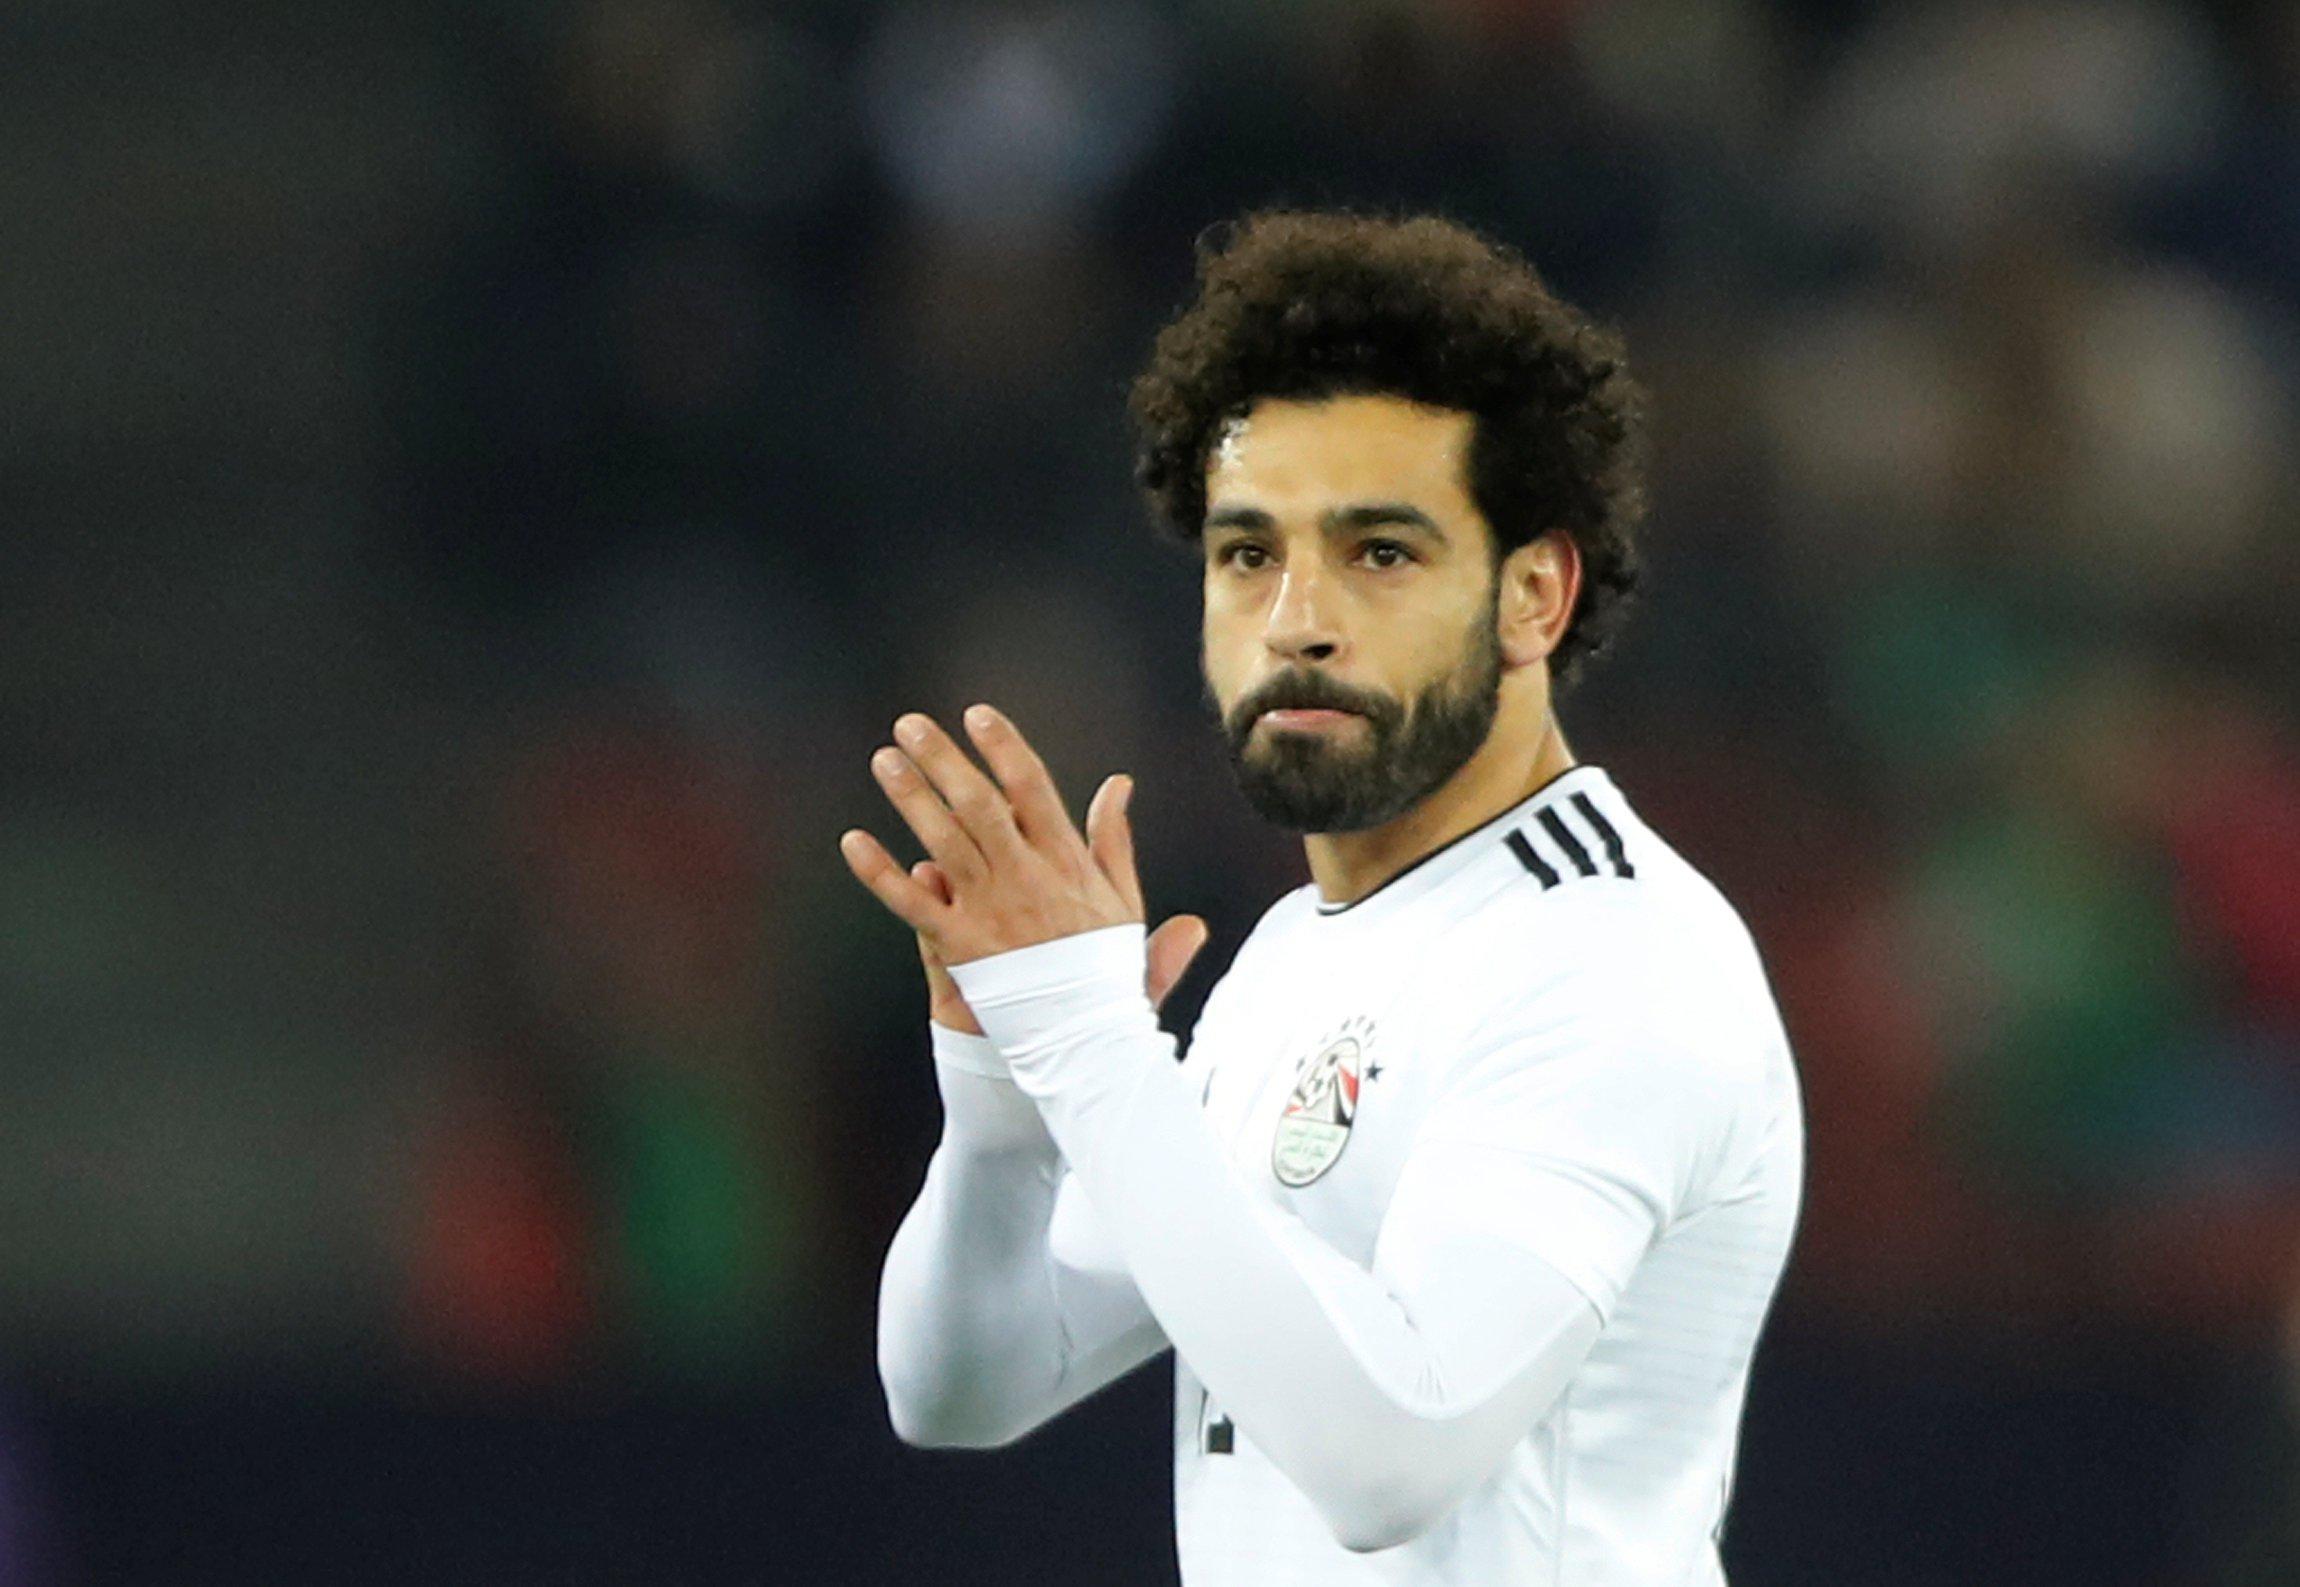 Soccer Football - International Friendly - Portugal vs Egypt - Letzigrund, Zurich, Switzerland - March 23, 2018 Egypt???s Mohamed Salah applauds fans as he is substituted off REUTERS/Arnd Wiegmann